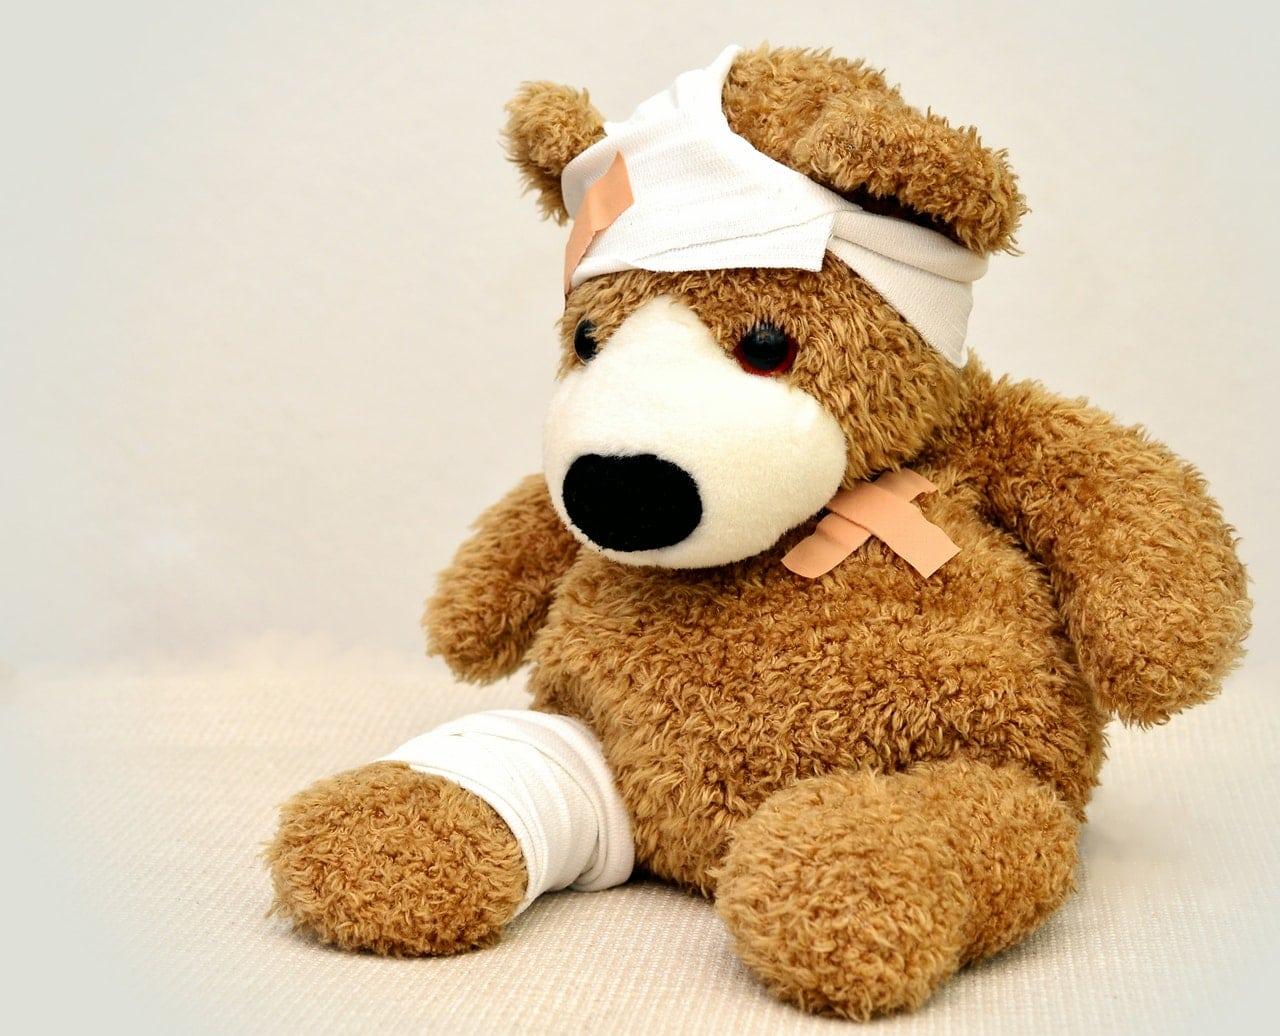 Acute and Chronic Injury